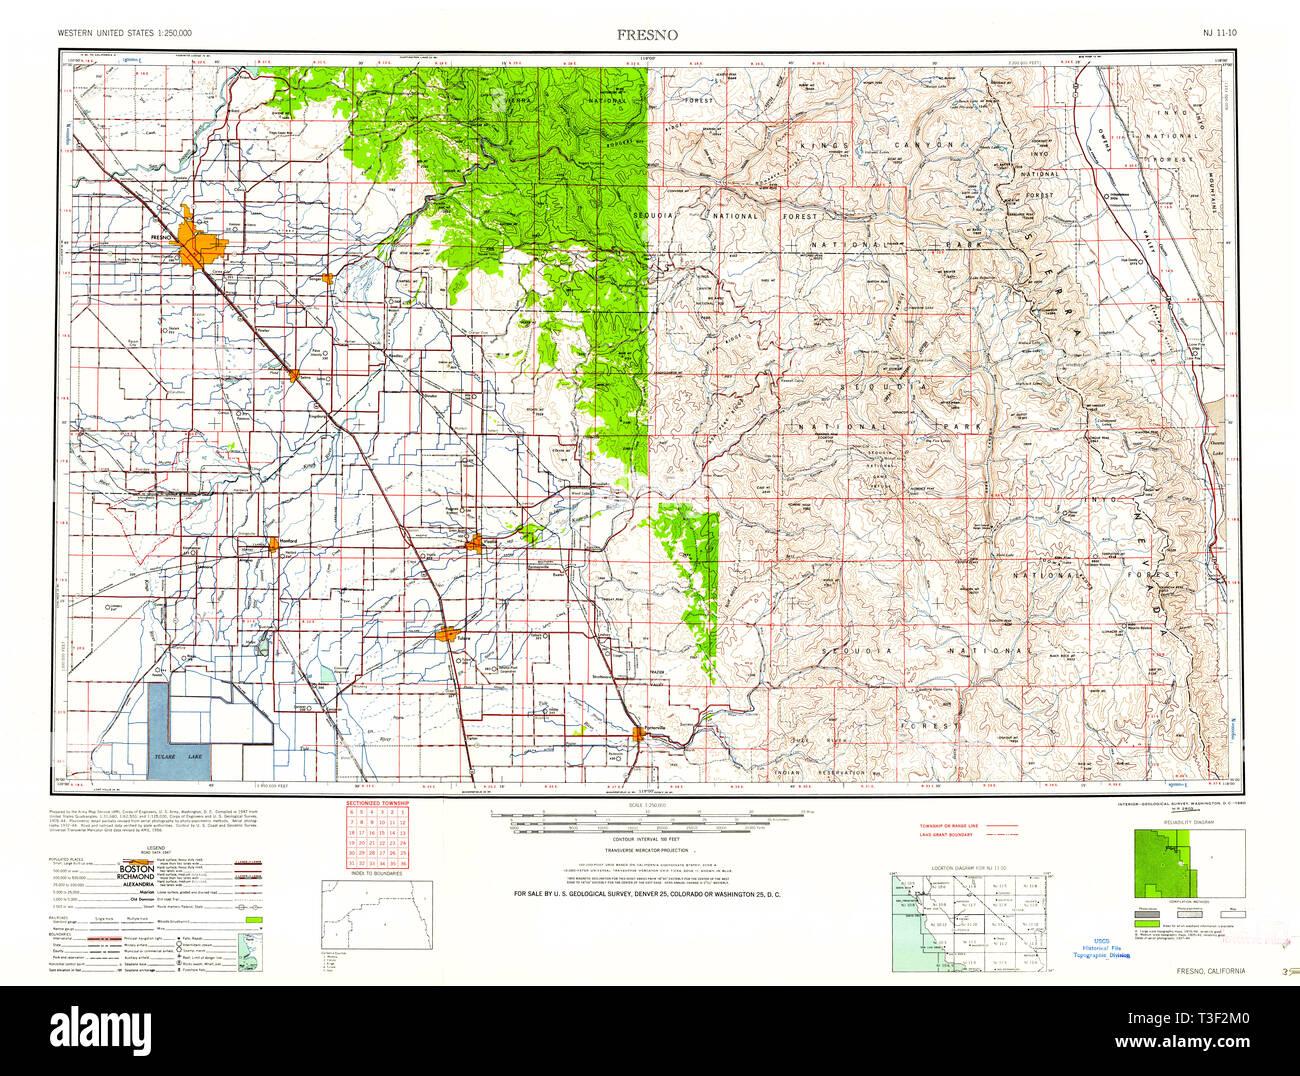 Map Of California Fresno.Map Of Fresno California Stock Photos Map Of Fresno California